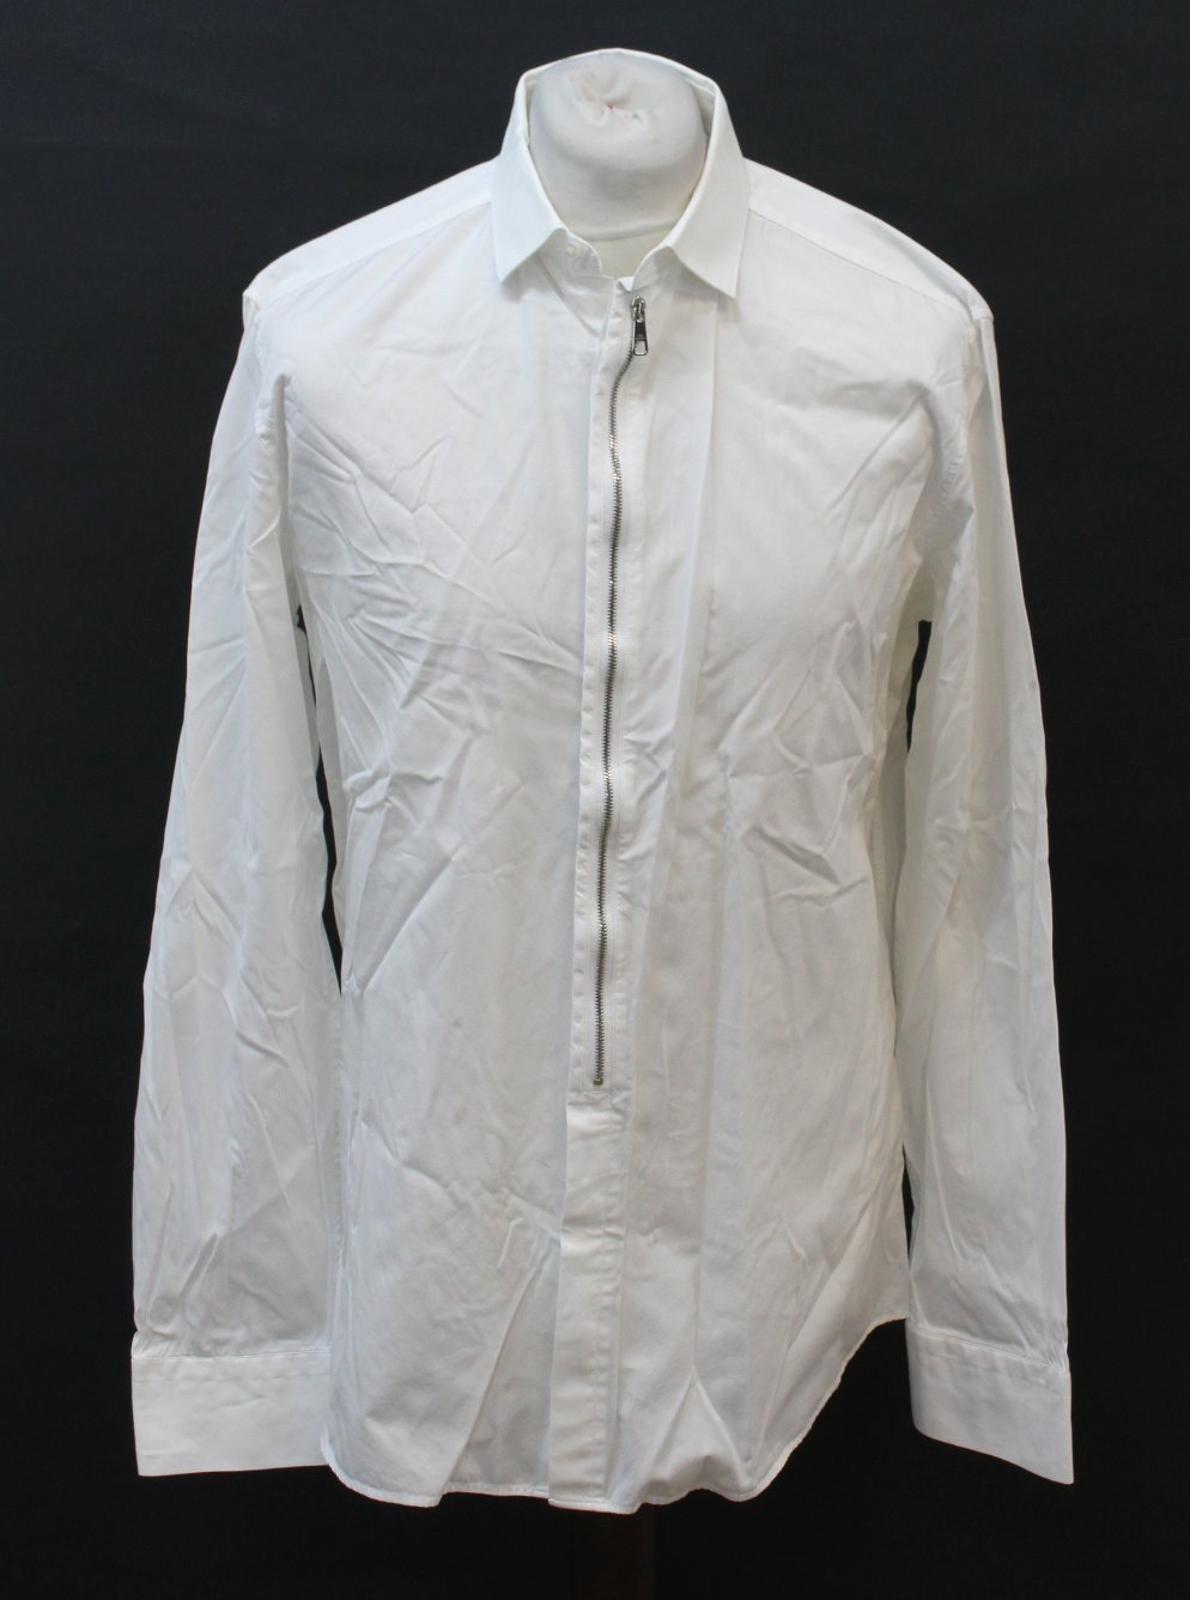 Neil-Barrett-para-hombre-calce-cenido-de-algodon-Blanco-Detalle-De-Cremallera-Botones-Camisa-Cuello miniatura 12